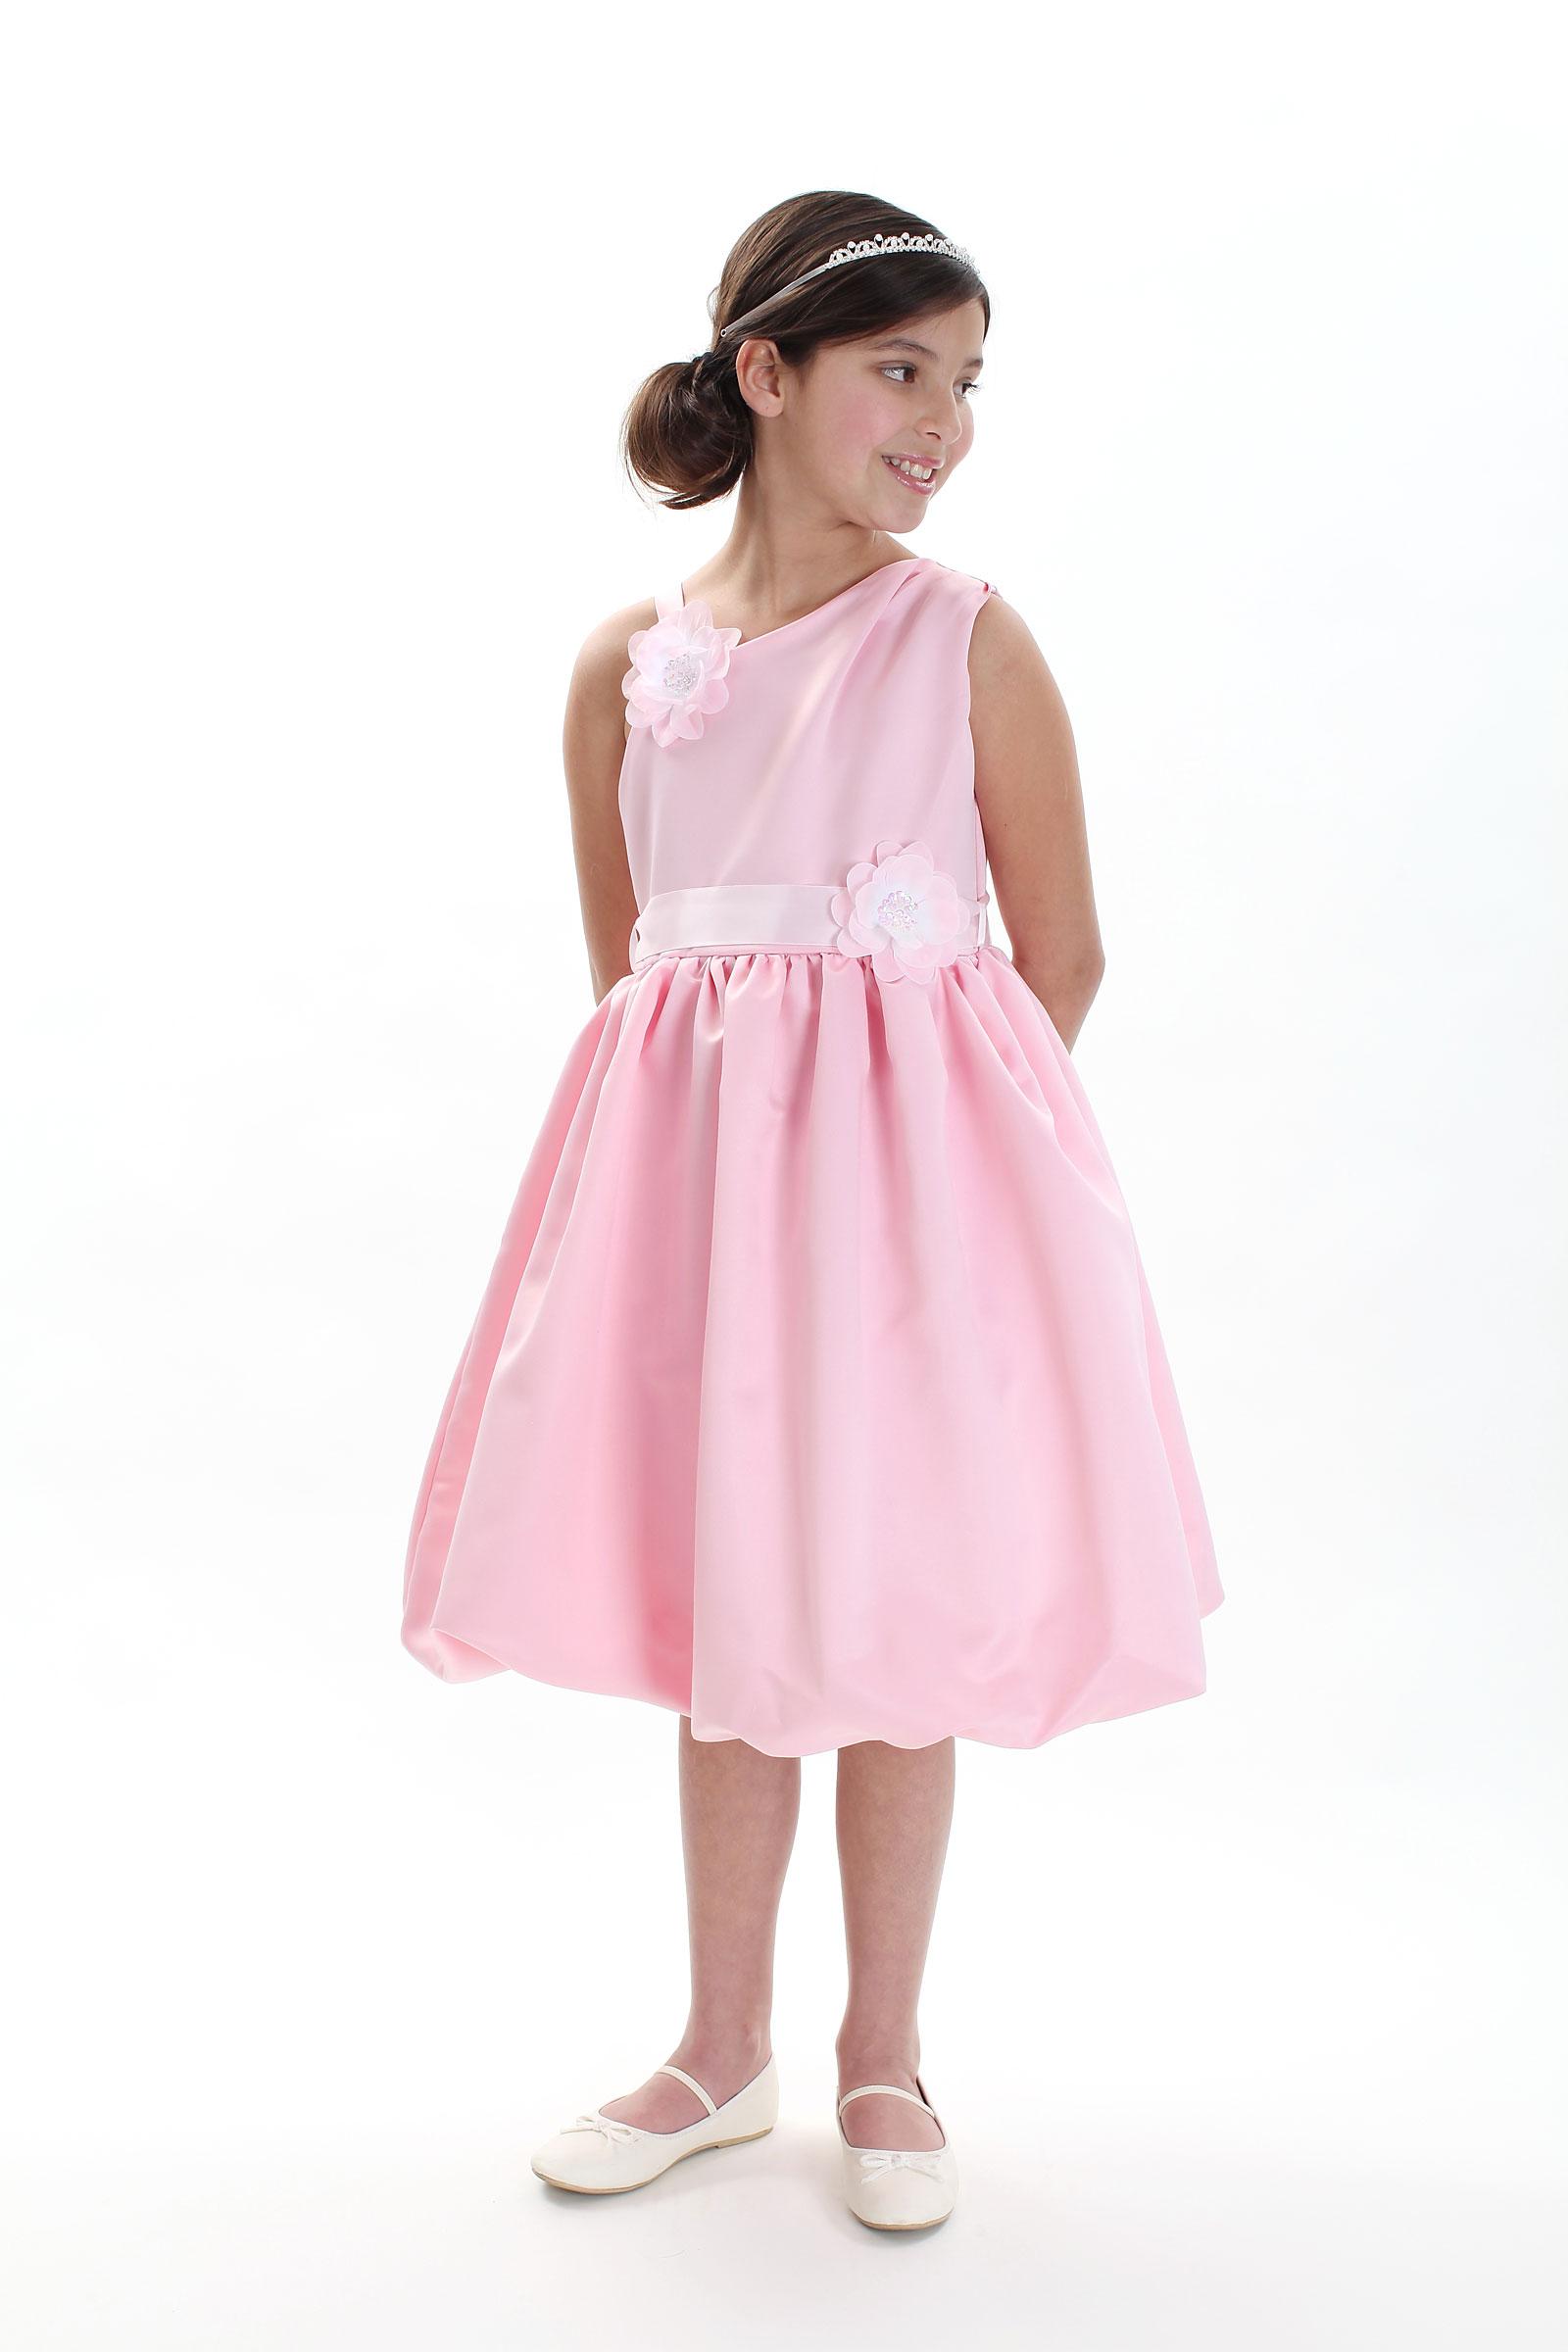 CC 1187P Girls Dress Style 1187 PINK Asymmetrical Dress with Bubble Skirt